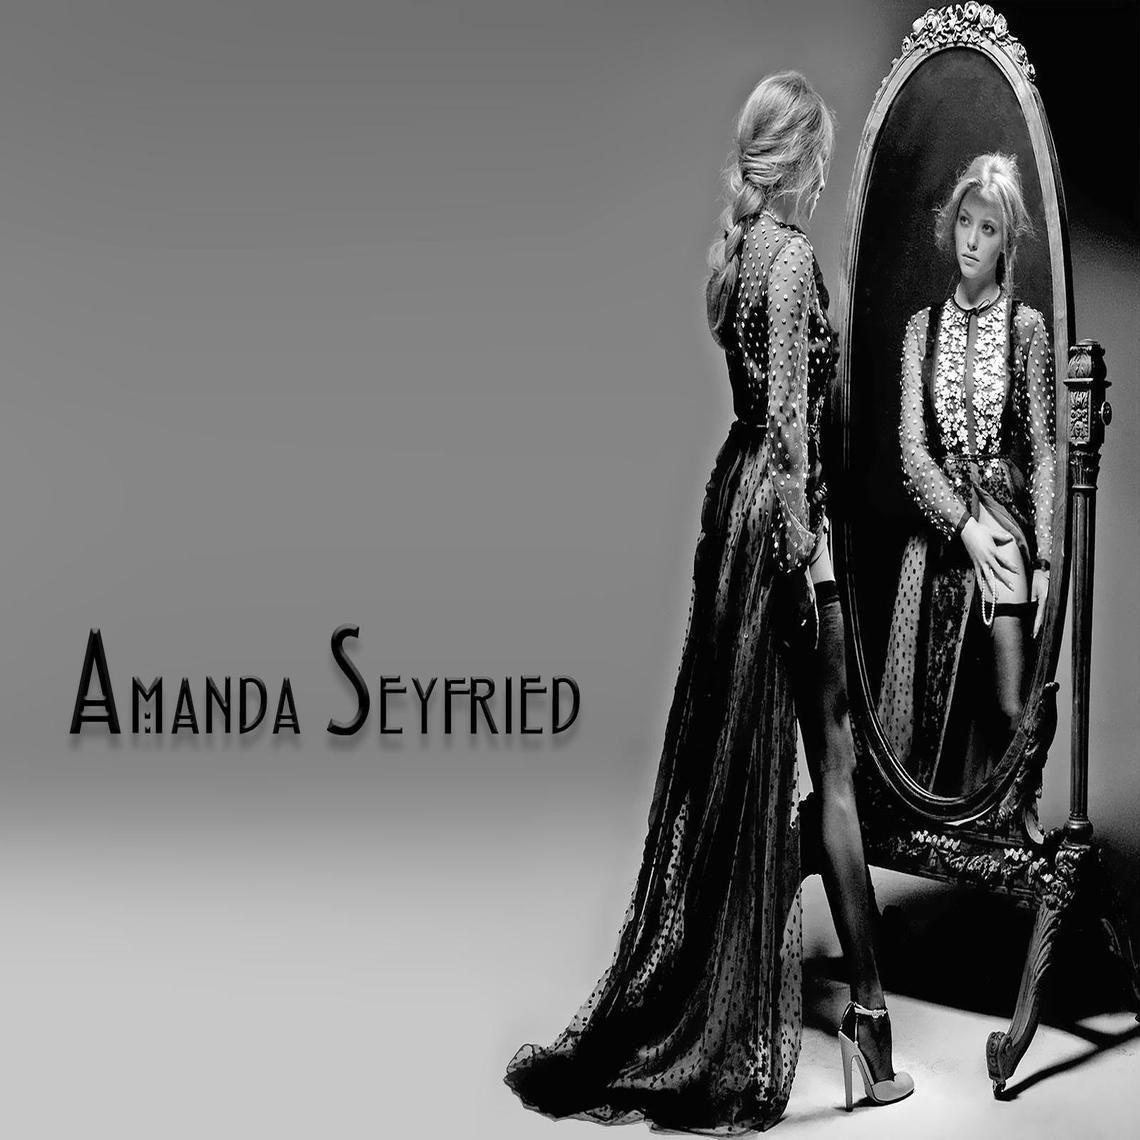 Amanda seyfried wallpaper pinterest amanda seyfried and rock